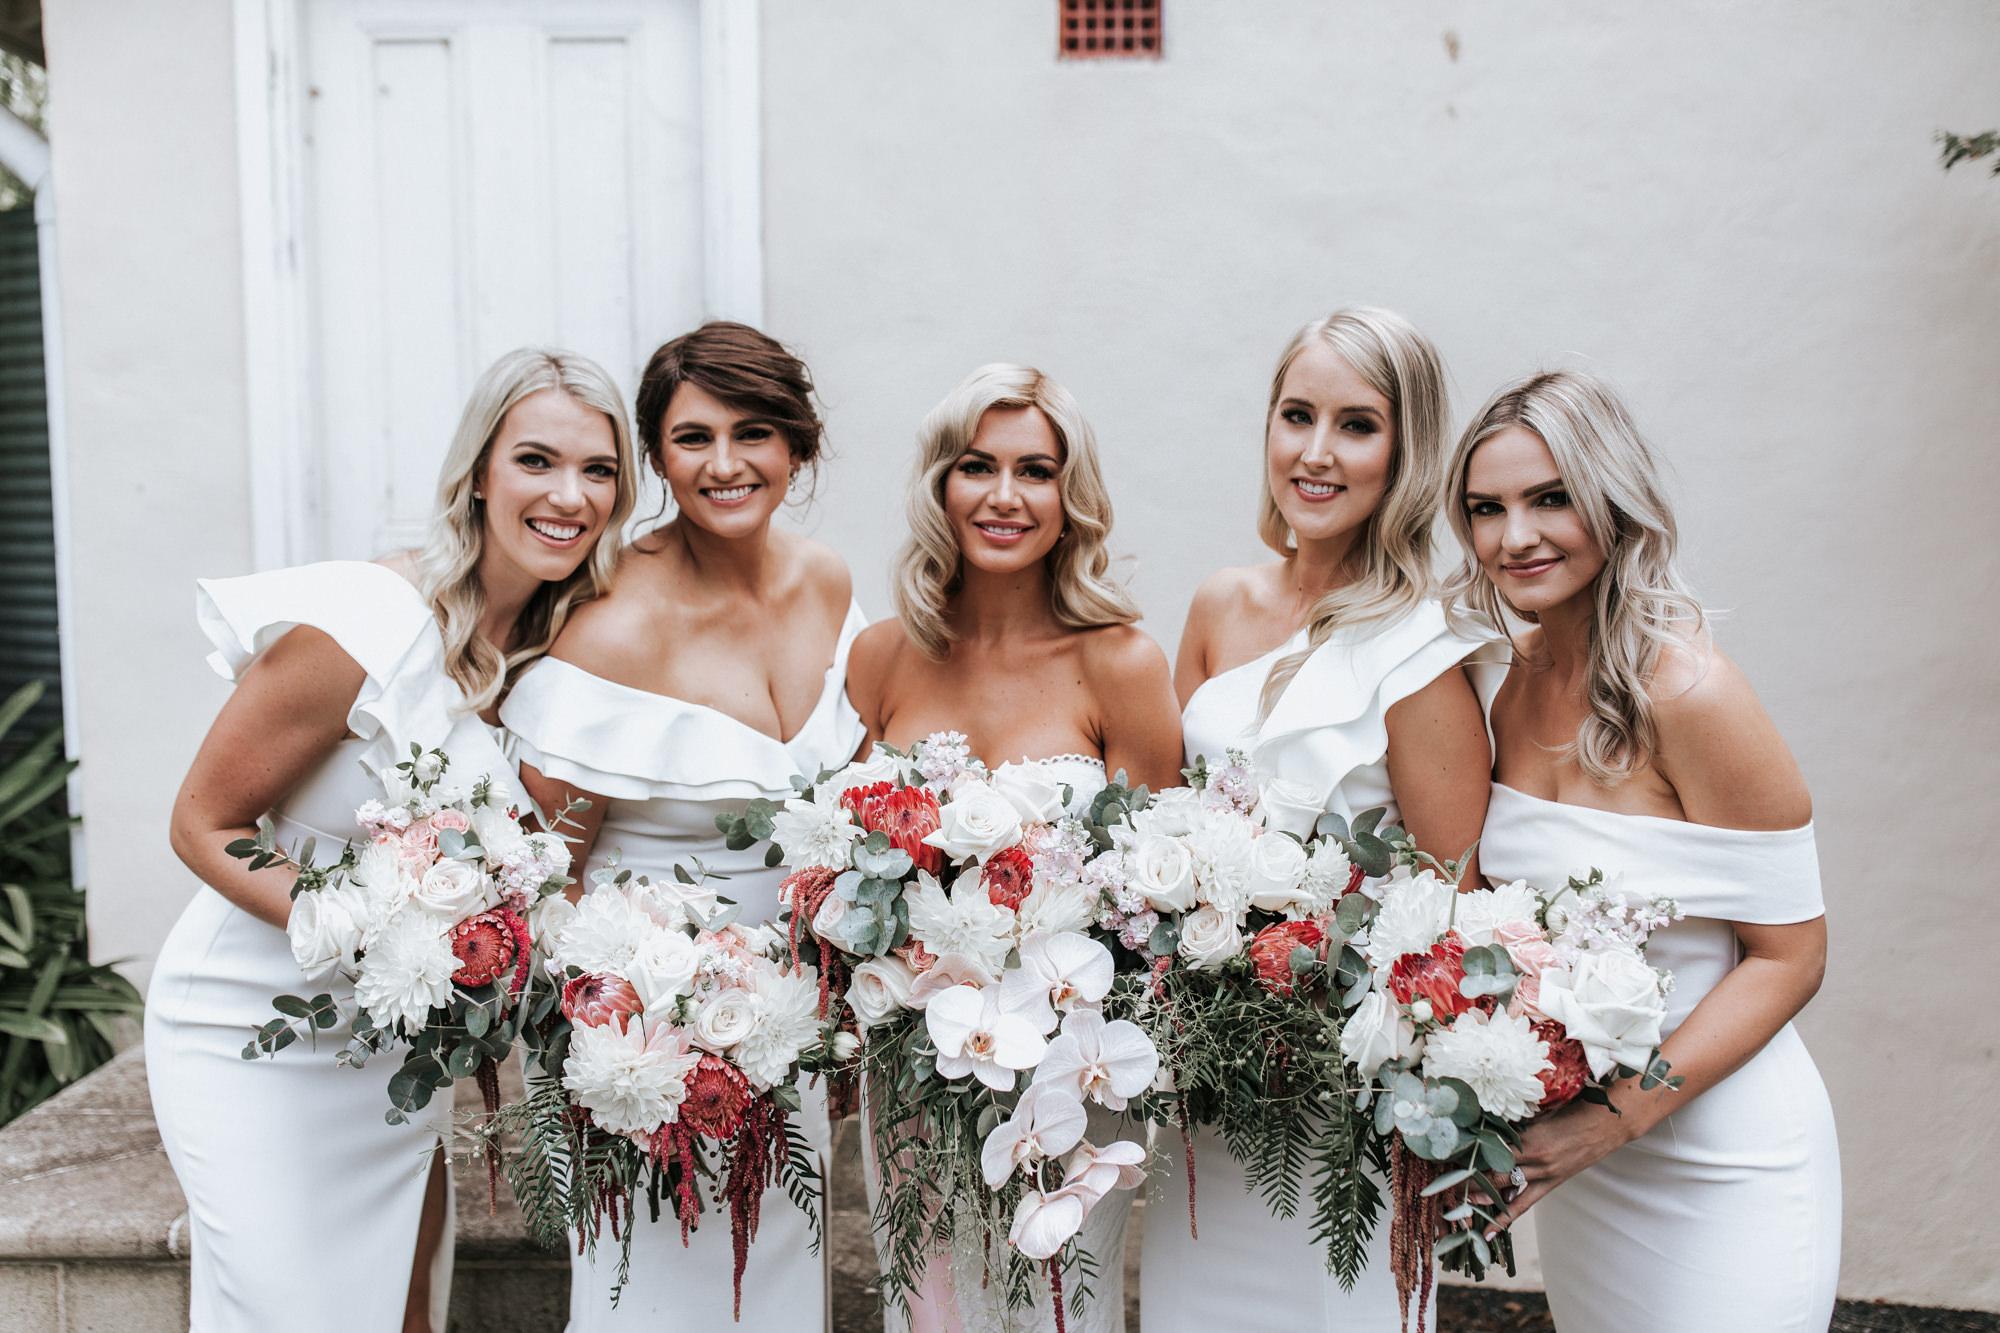 mali-brae-wedding-natalie-scott-baldwin-9.jpg